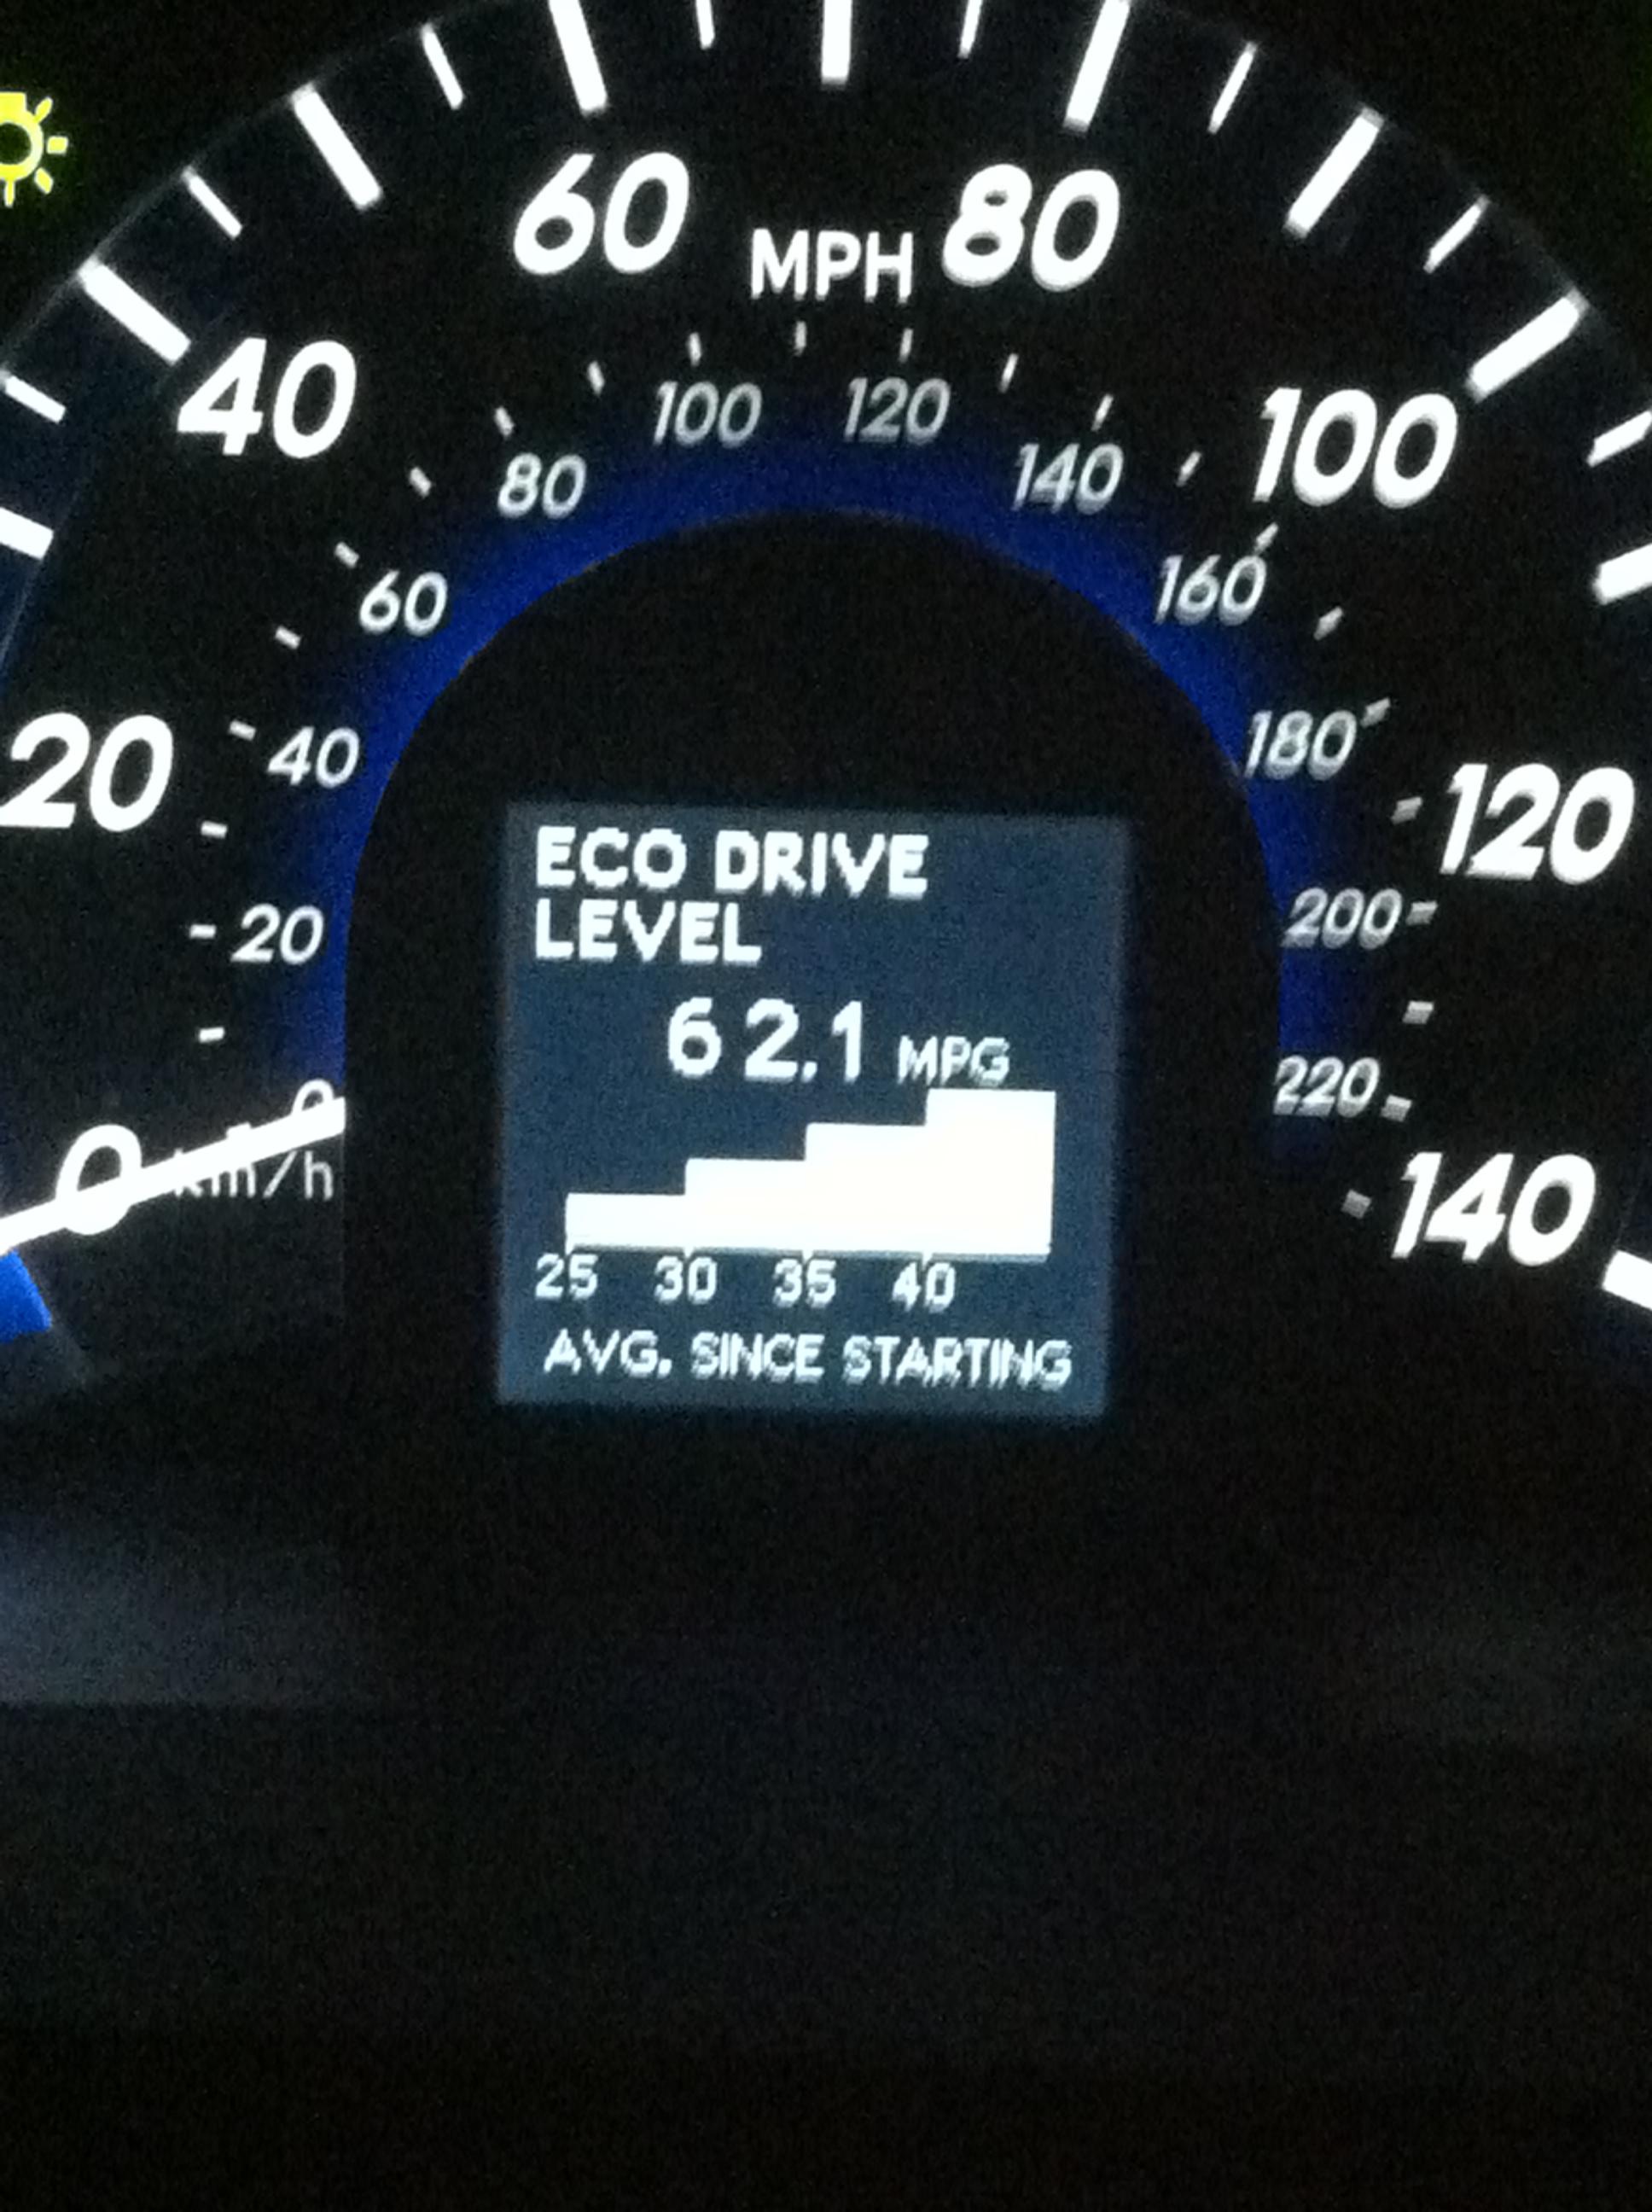 Toyota Camry Hybrid best MPG 62.1 mpg